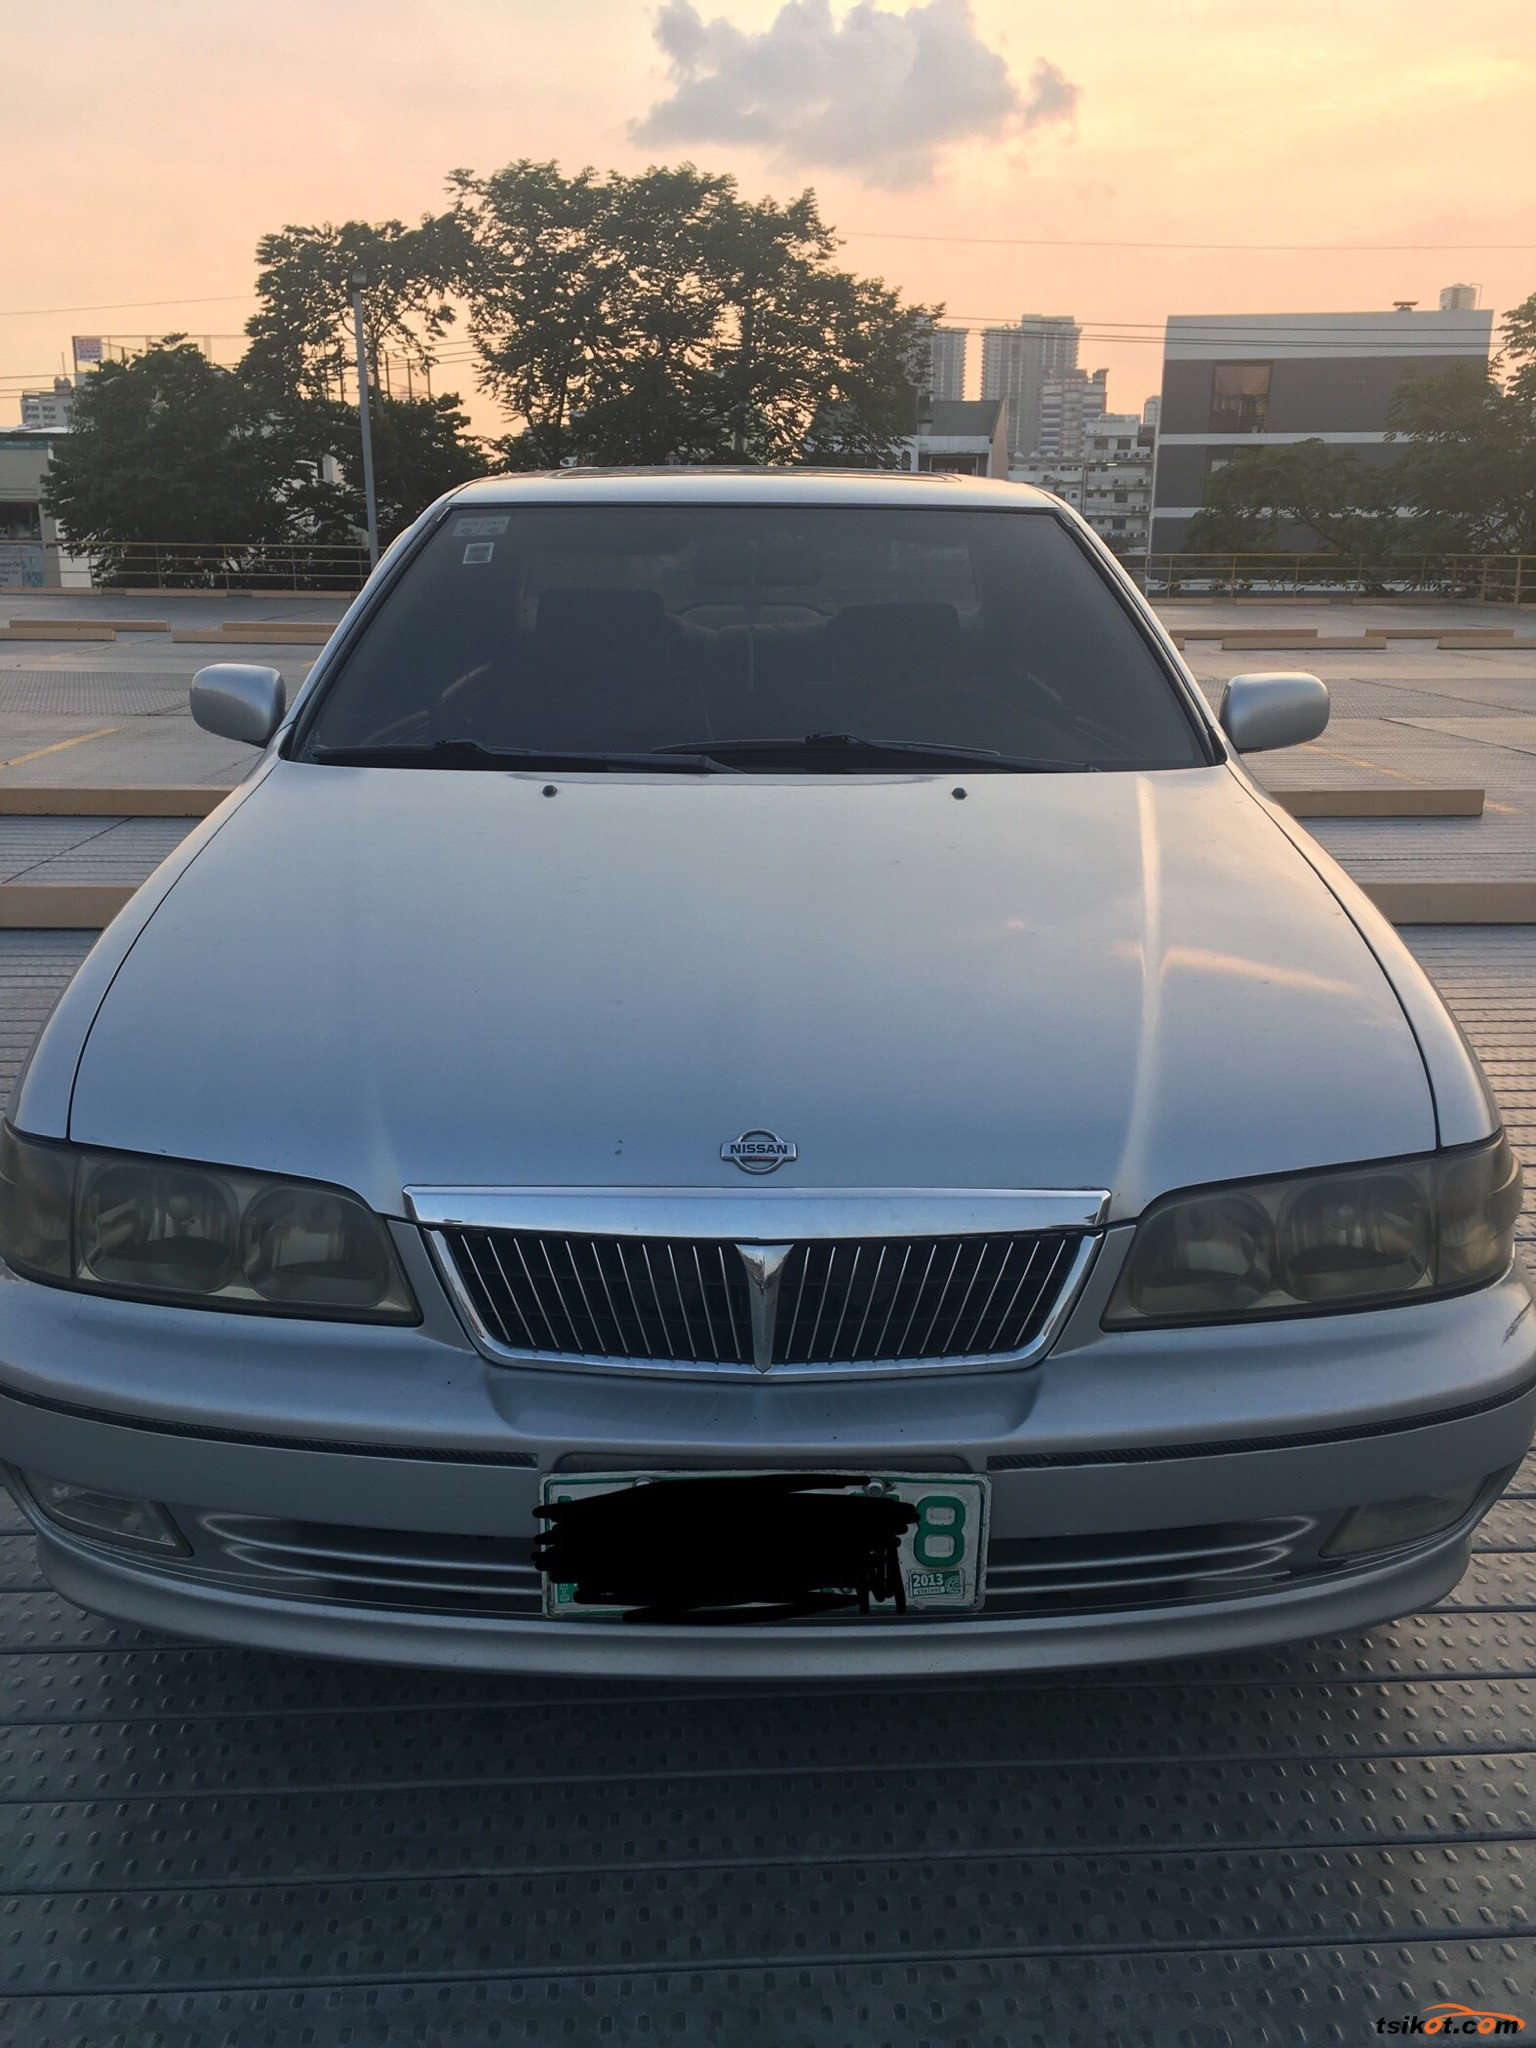 Nissan Sentra 2000 - 1